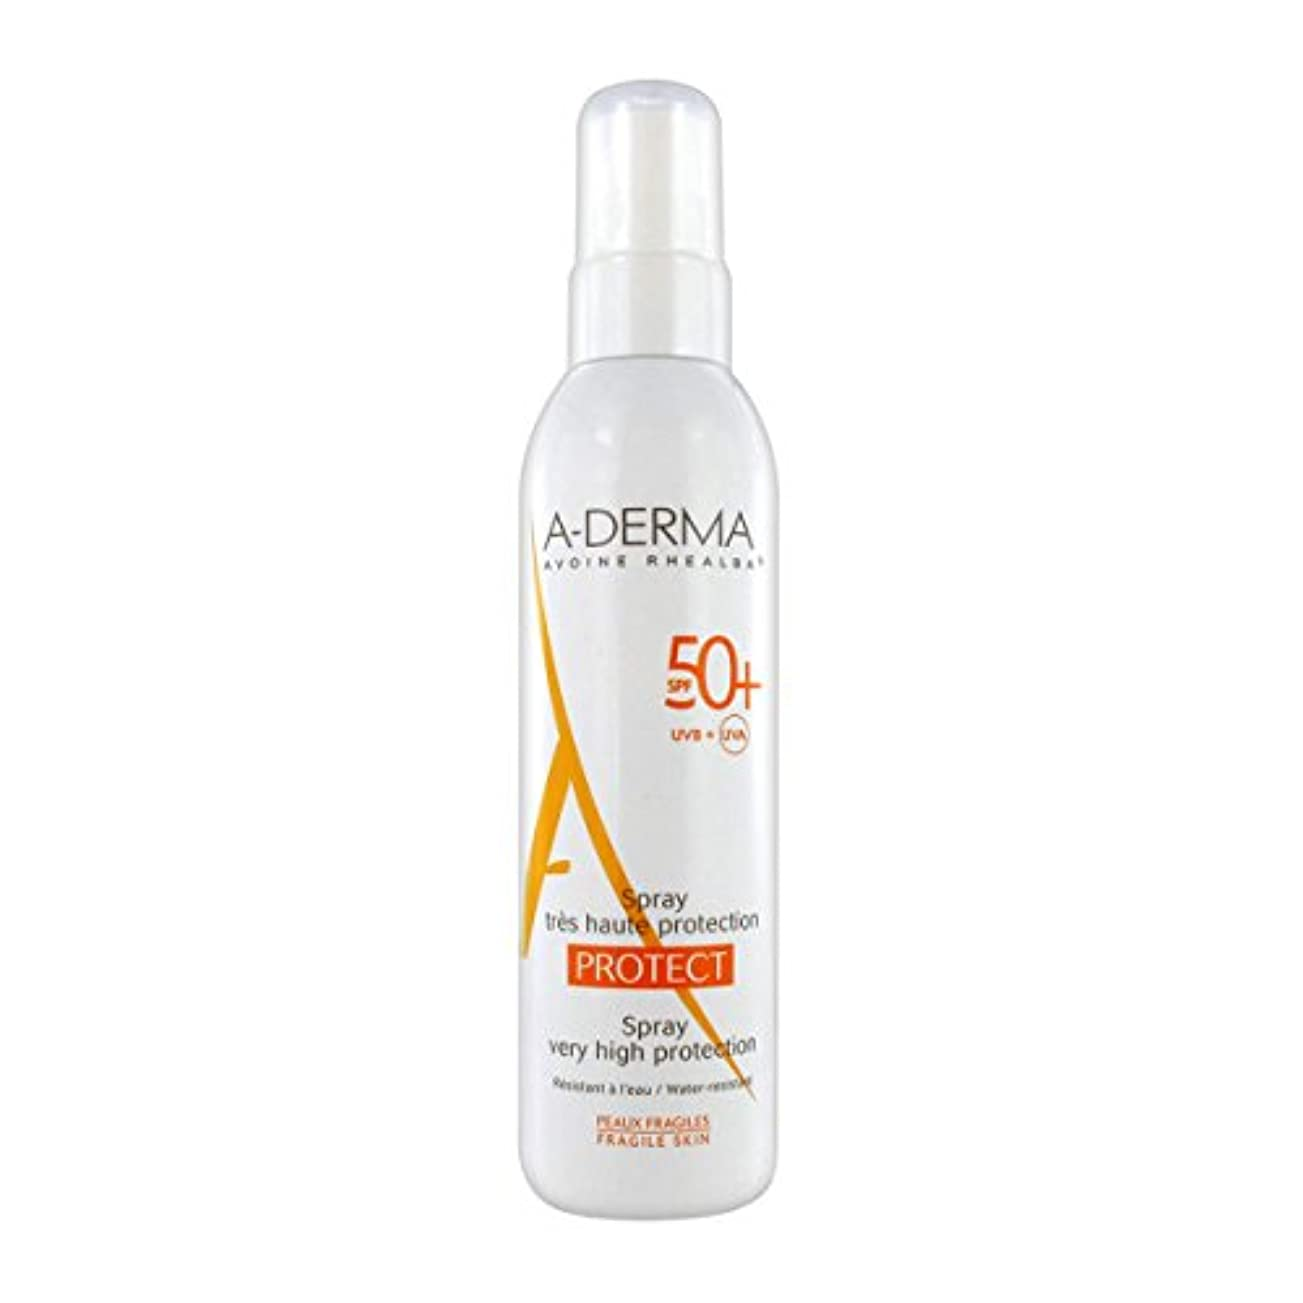 脊椎成功同志A-derma Protect Spray Spf50+ 200ml [並行輸入品]